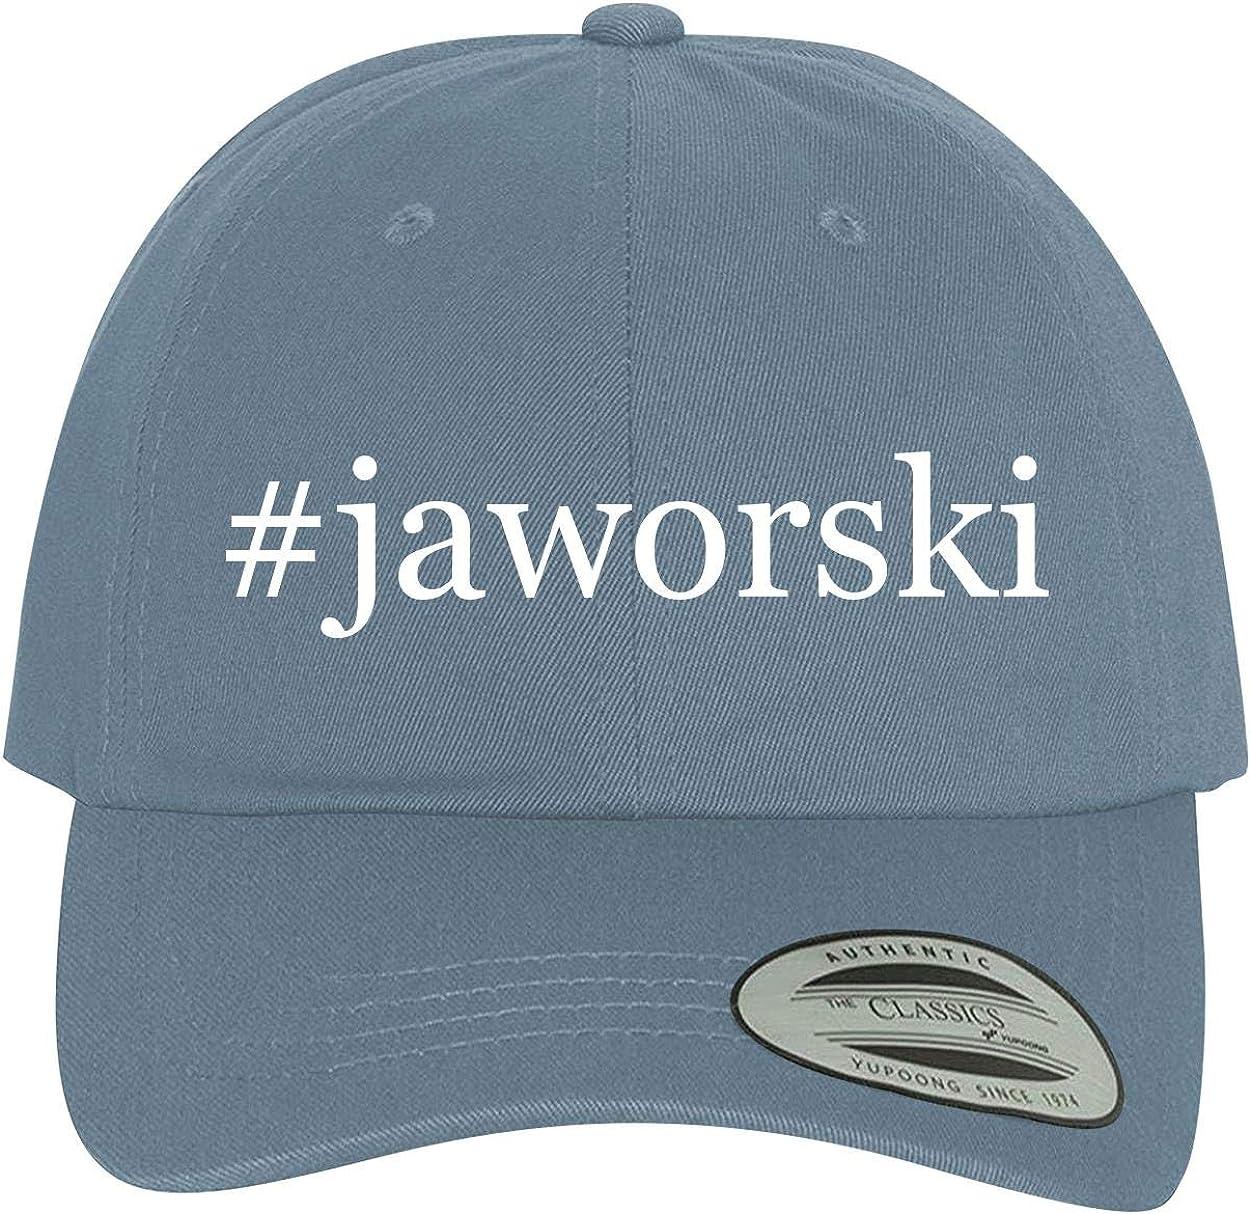 Comfortable Dad Hat Baseball Cap BH Cool Designs #Jaworski